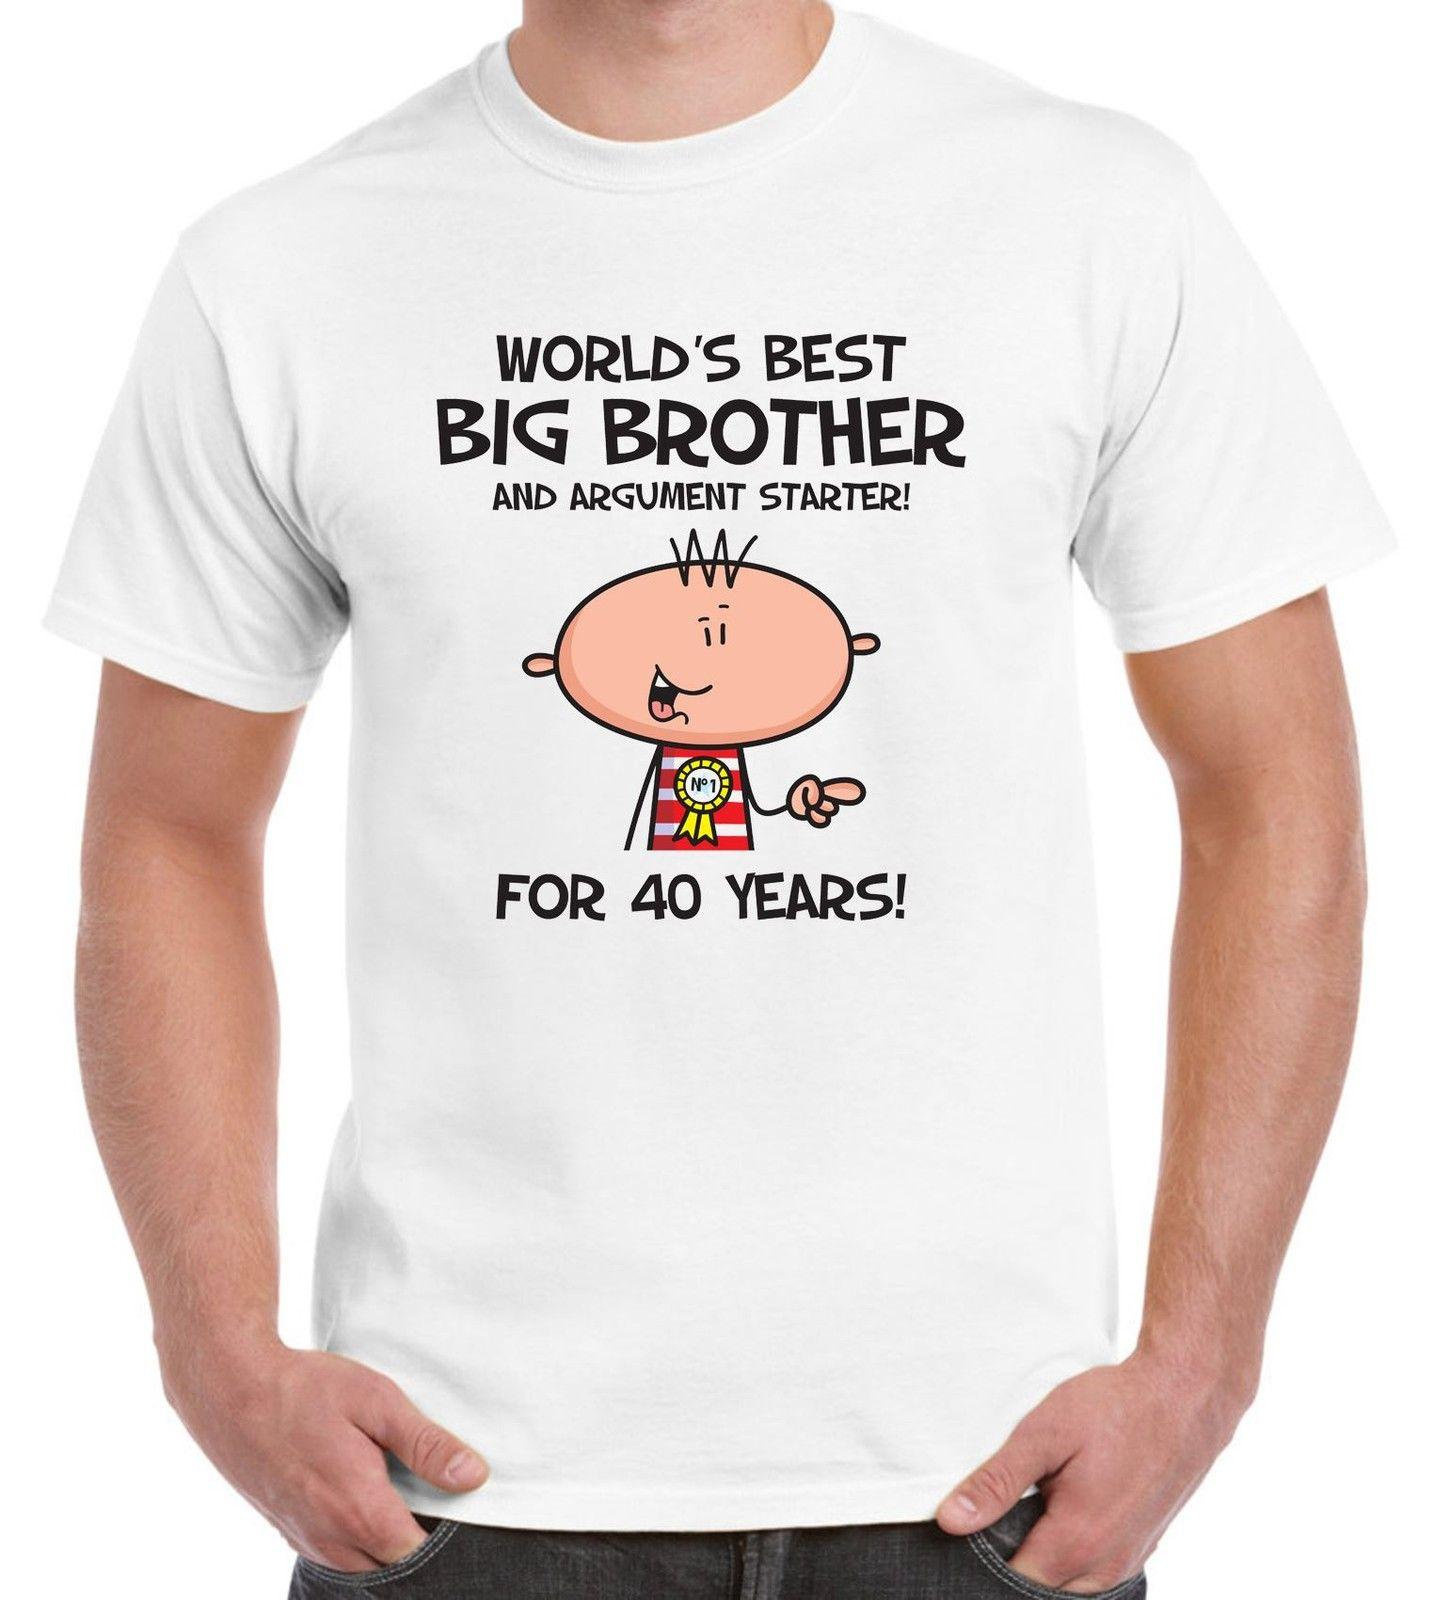 Details Zu Worlds Best Big Brother MenS 40th Birthday Present T Shirt Gift Funny Unisex Tee Shop Online Crazy From Stshirt 1296